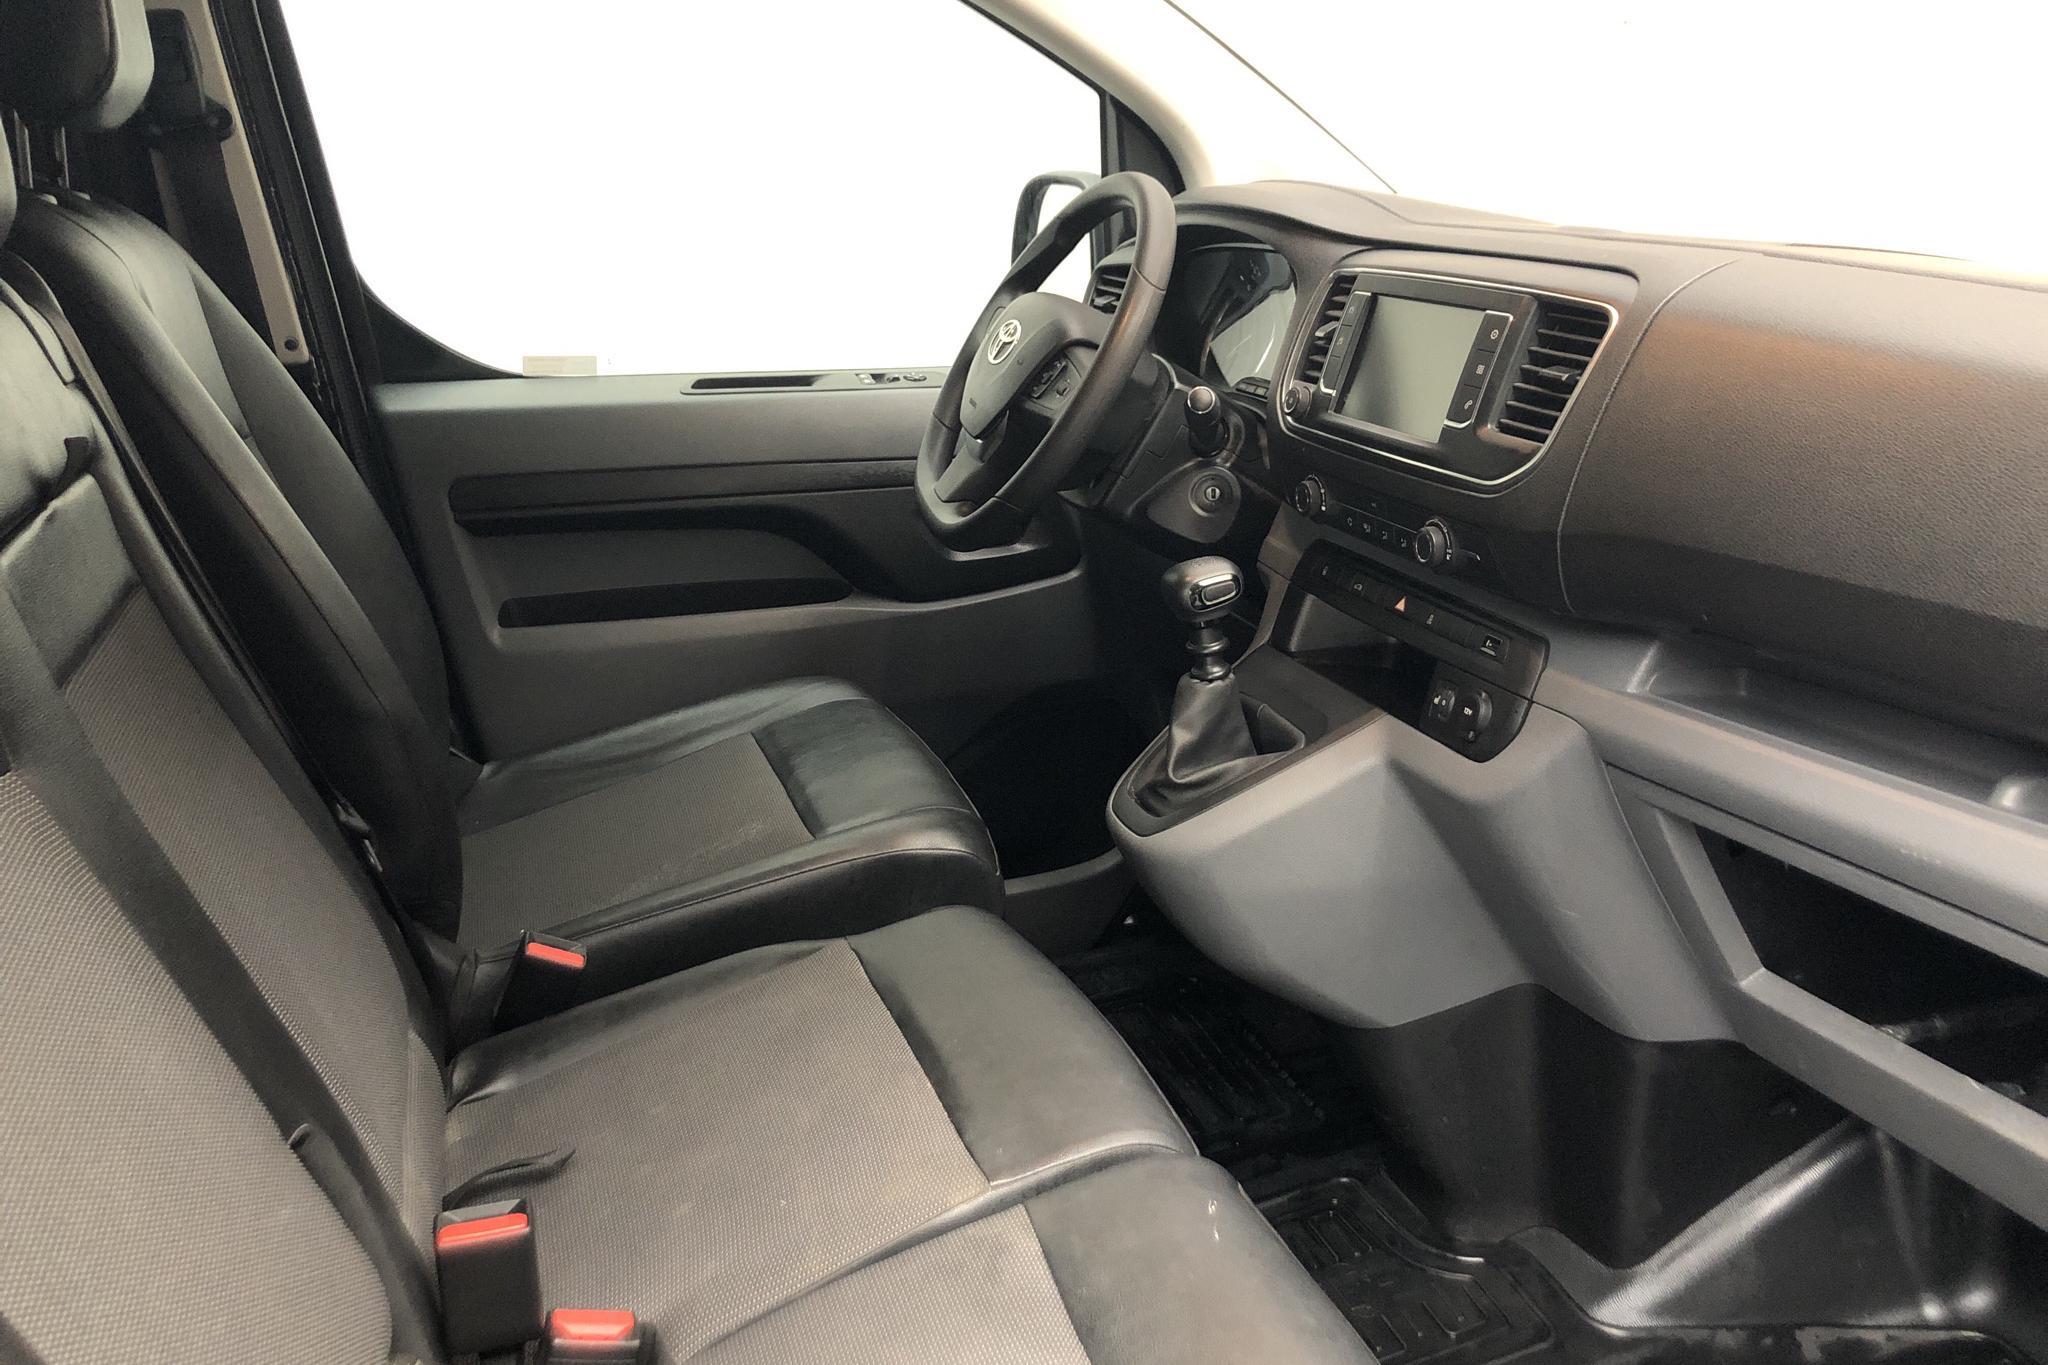 Toyota PROACE 2.0D (120hk) - 27 240 km - Manual - black - 2018